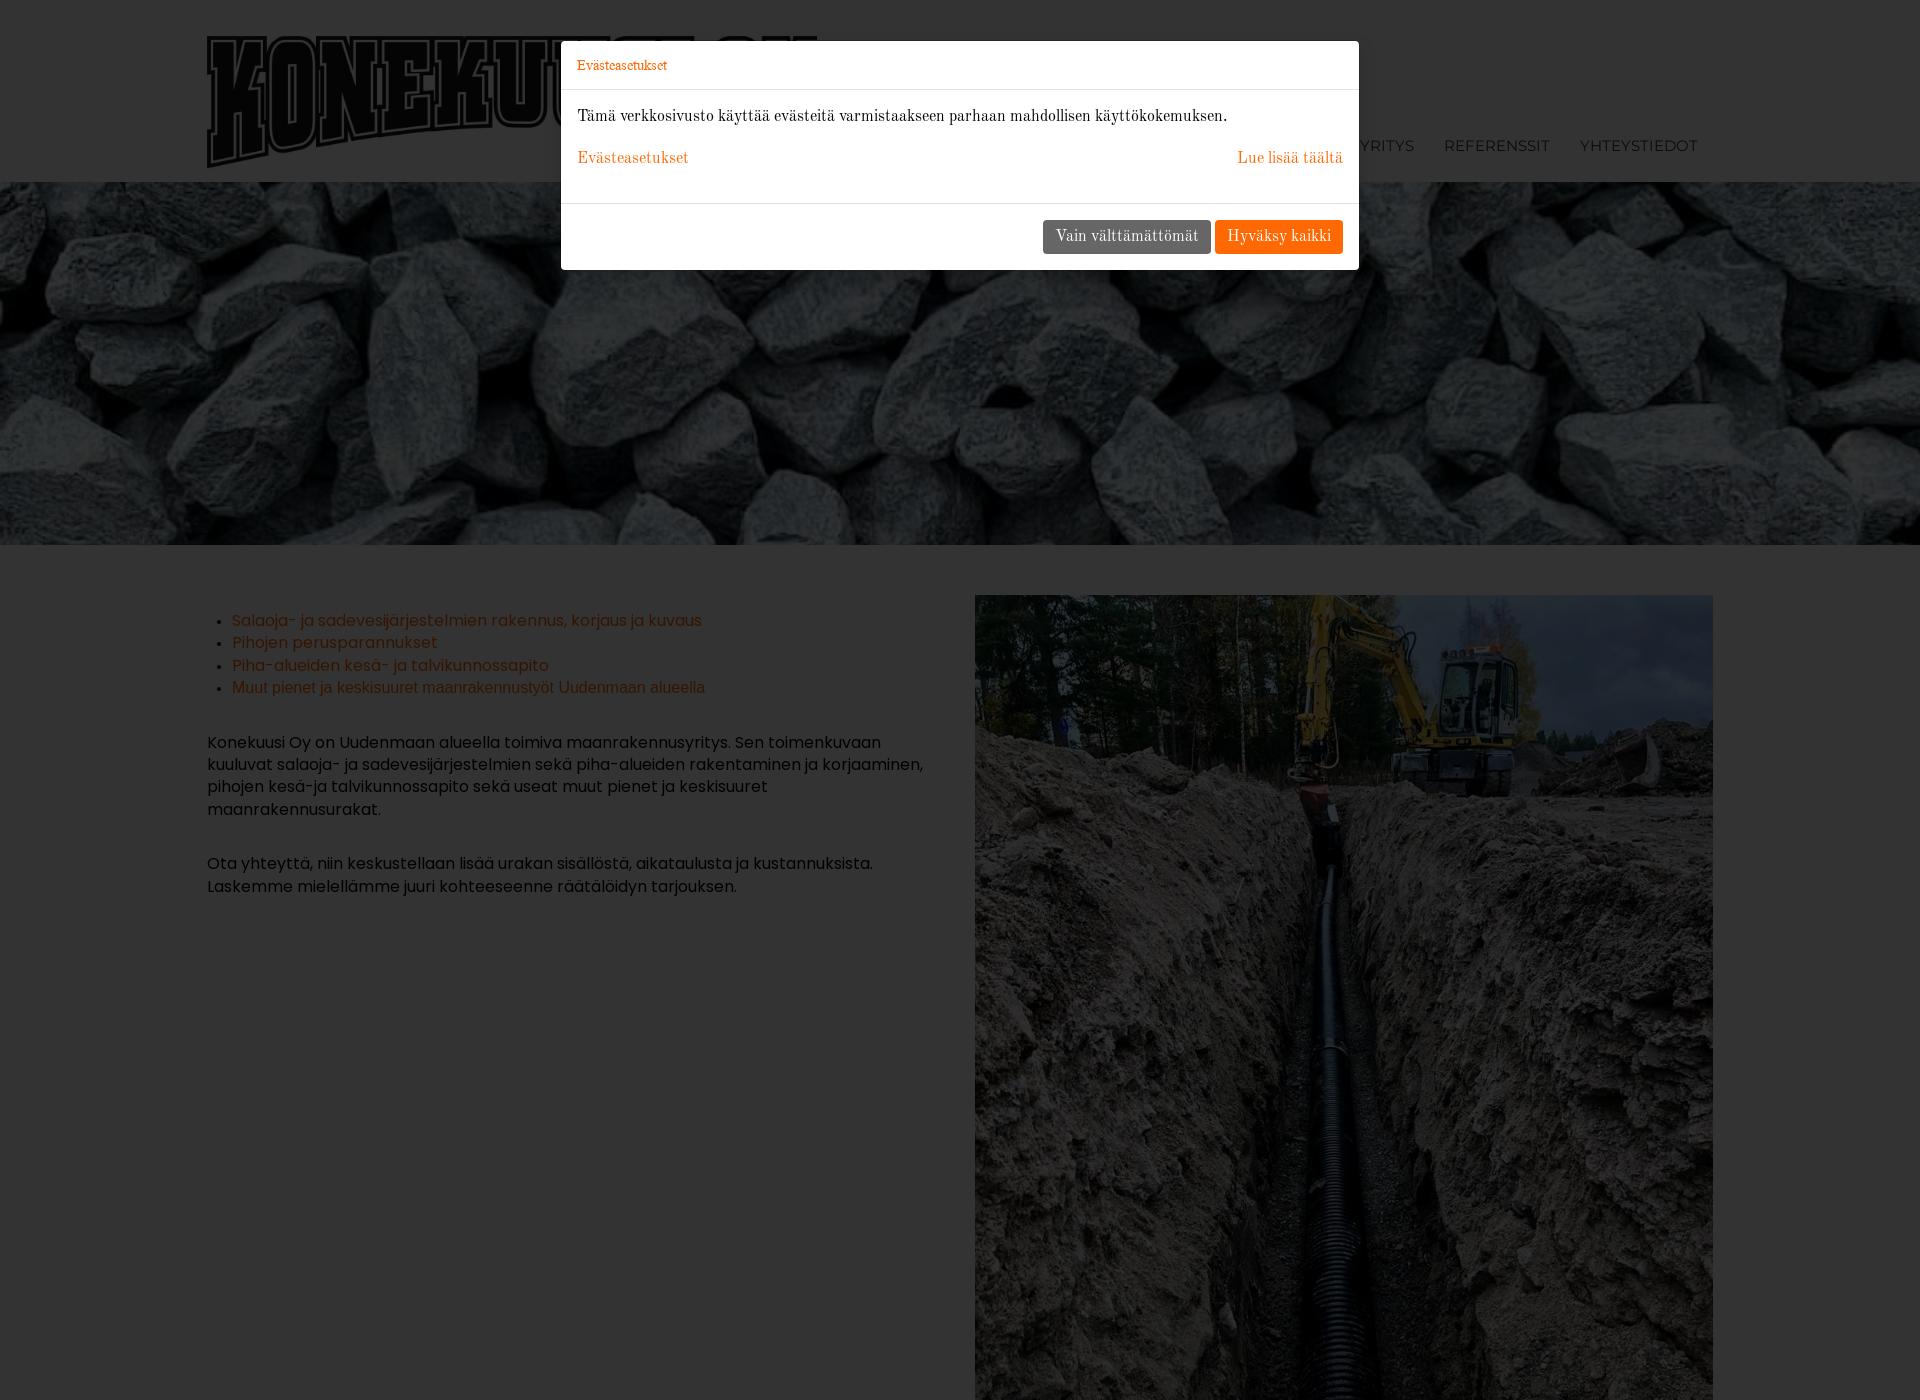 Screenshot for konekuusi.fi